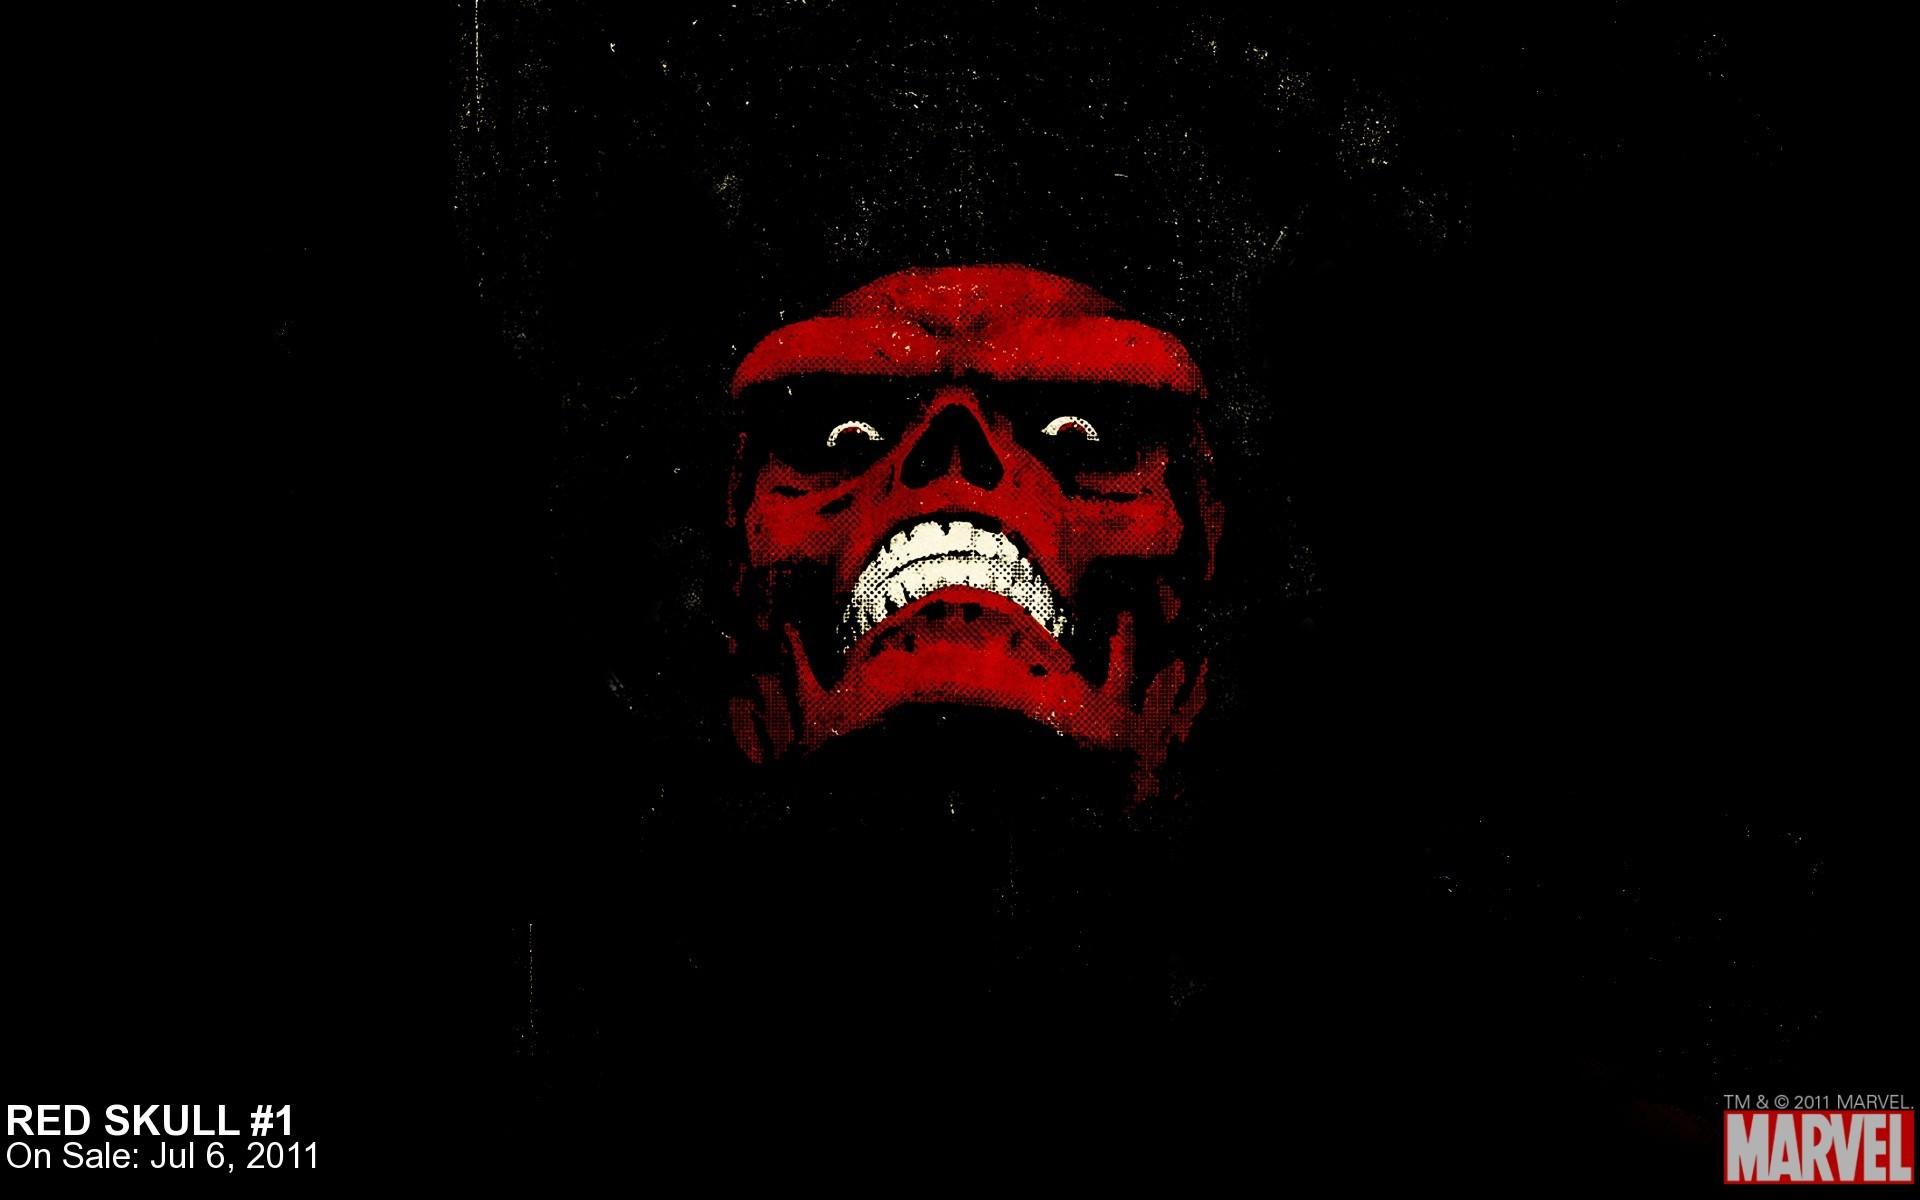 3d Superman Wallpaper Ii Android Marvel Red Skull Wallpaper 57 Images